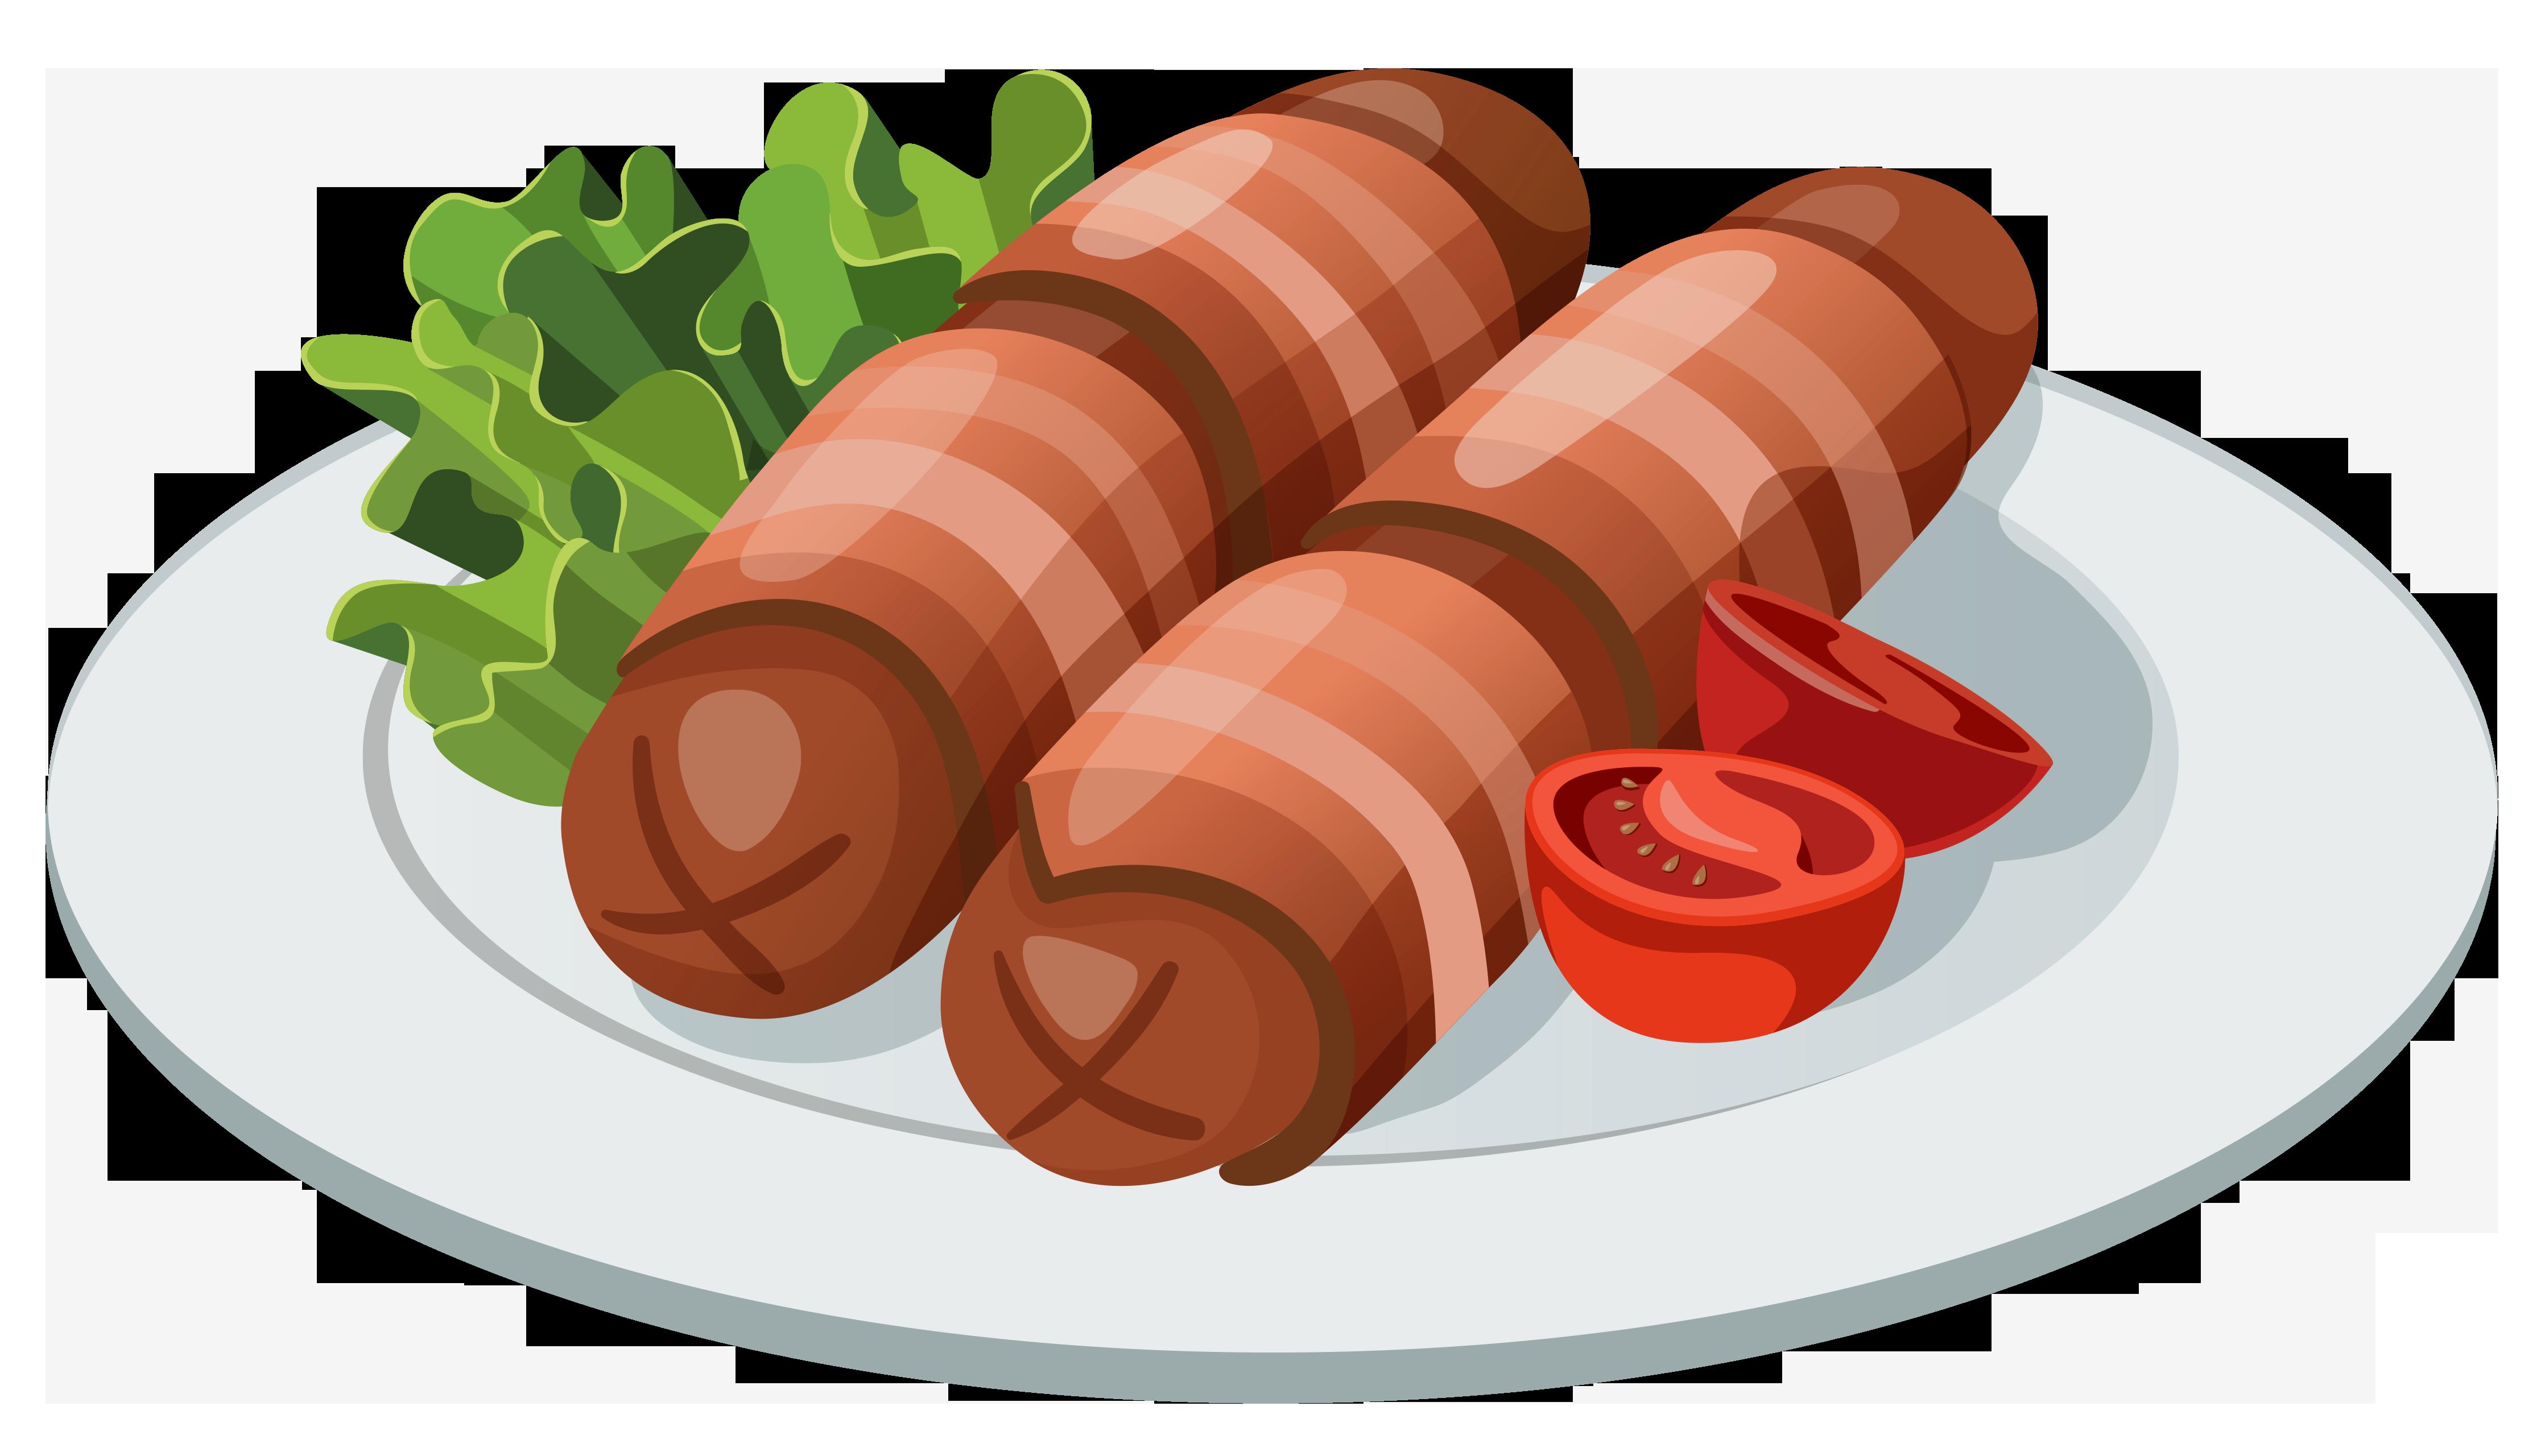 Elegant food clipart images graphic free library  graphic free library